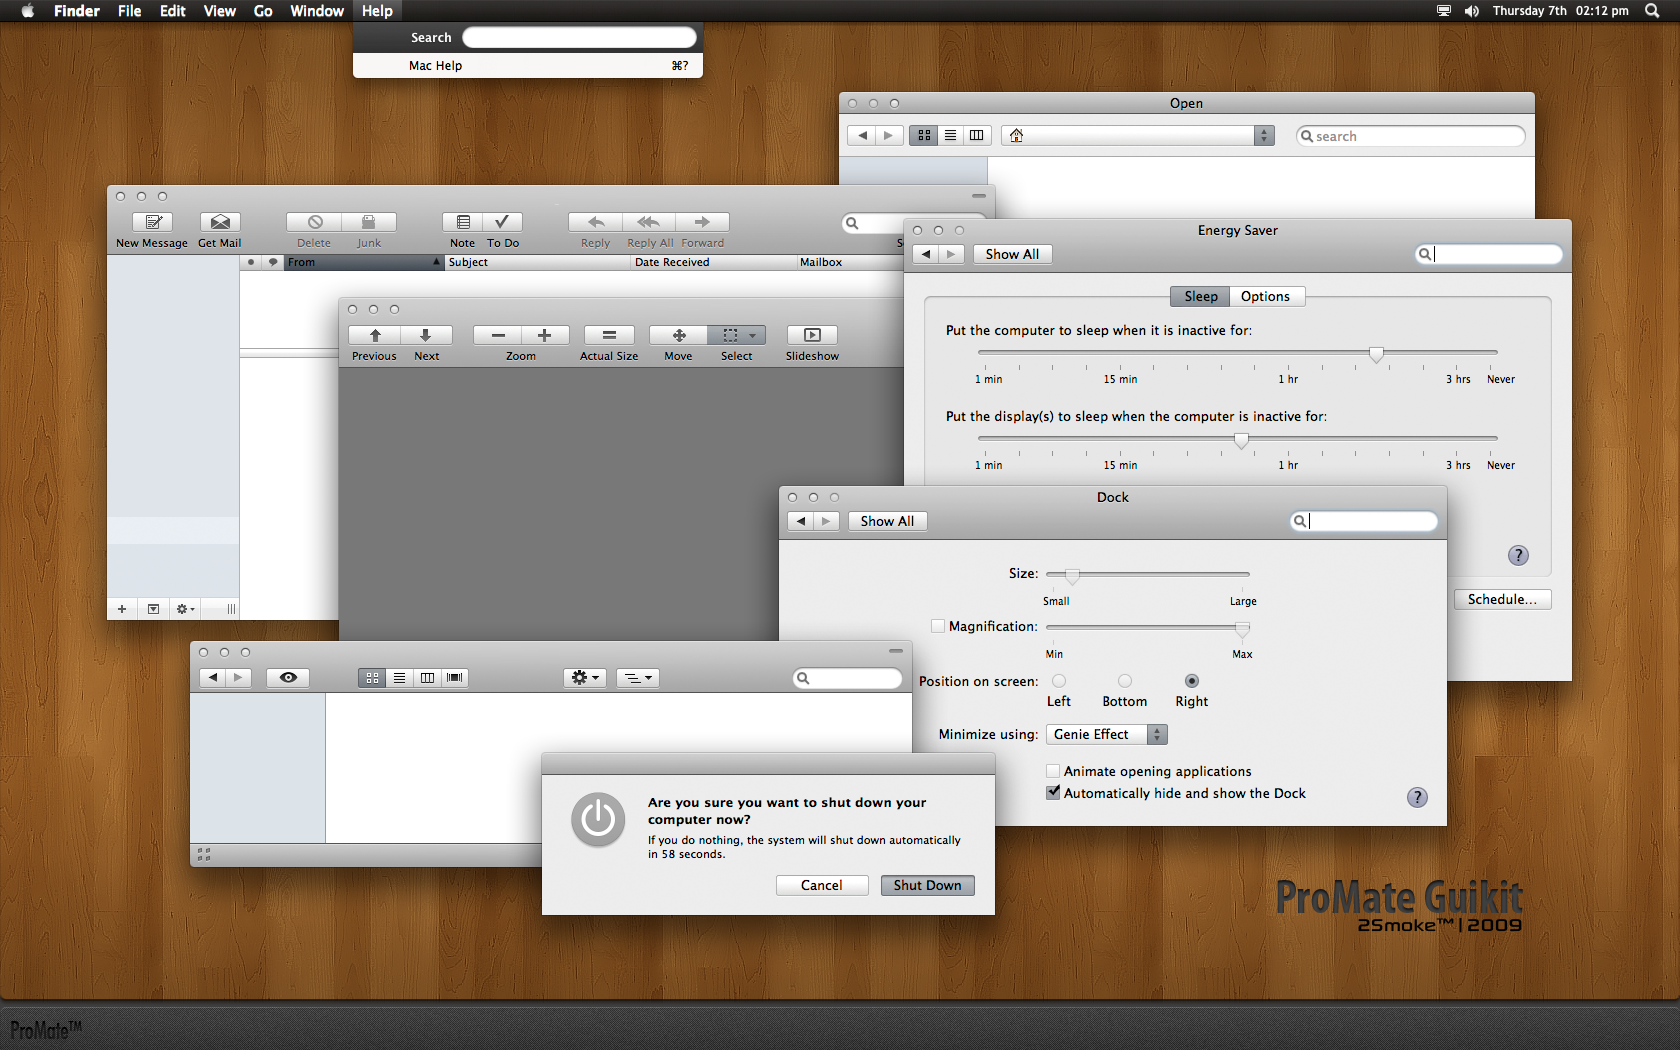 ProMate Public Beta 1 by neodesktop